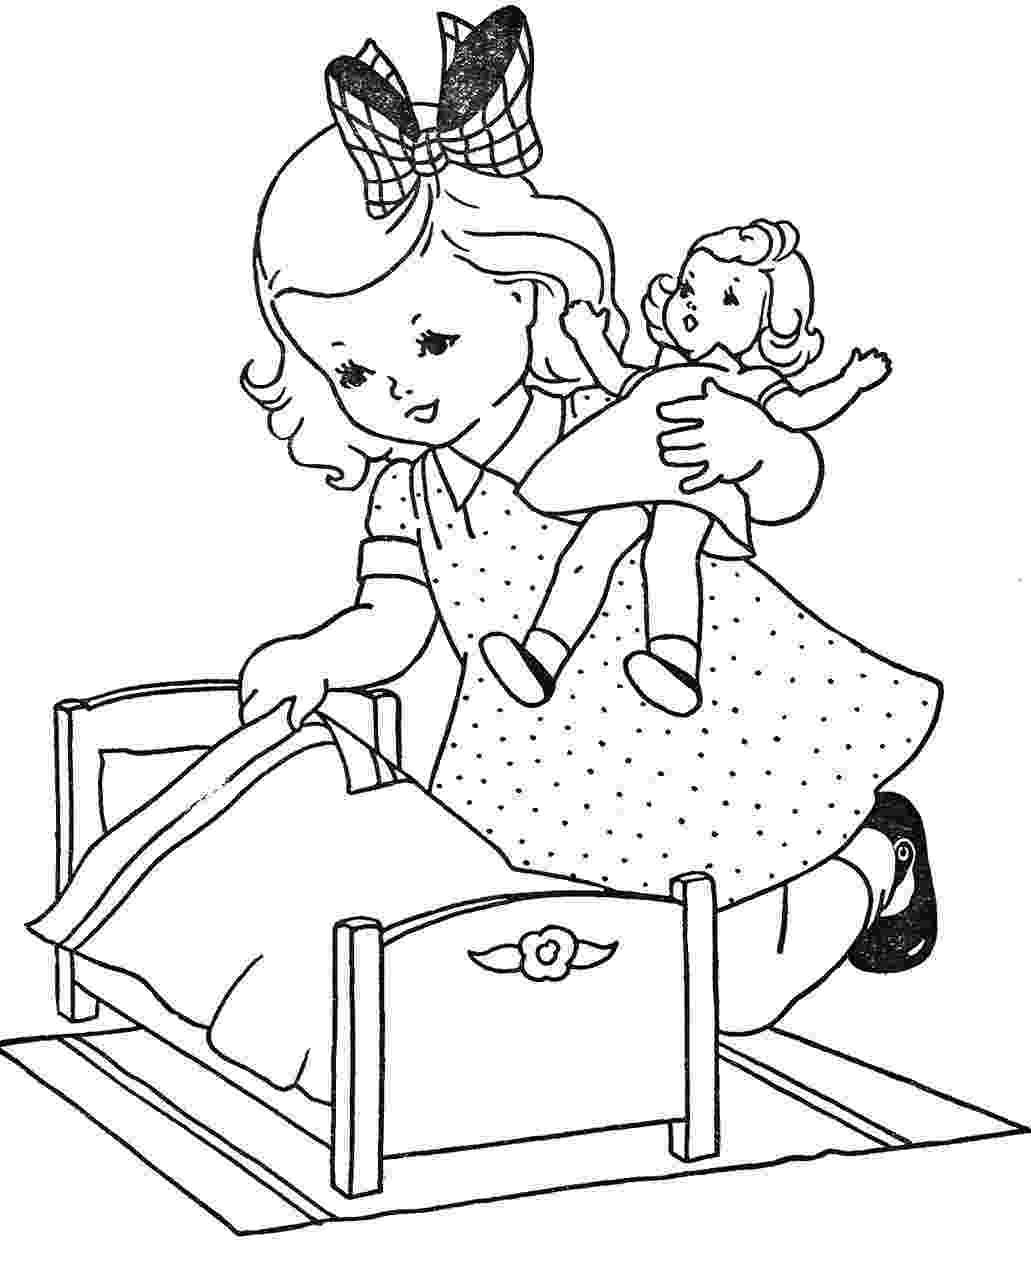 dolls coloring pages lol dolls coloring pages best coloring pages for kids dolls pages coloring